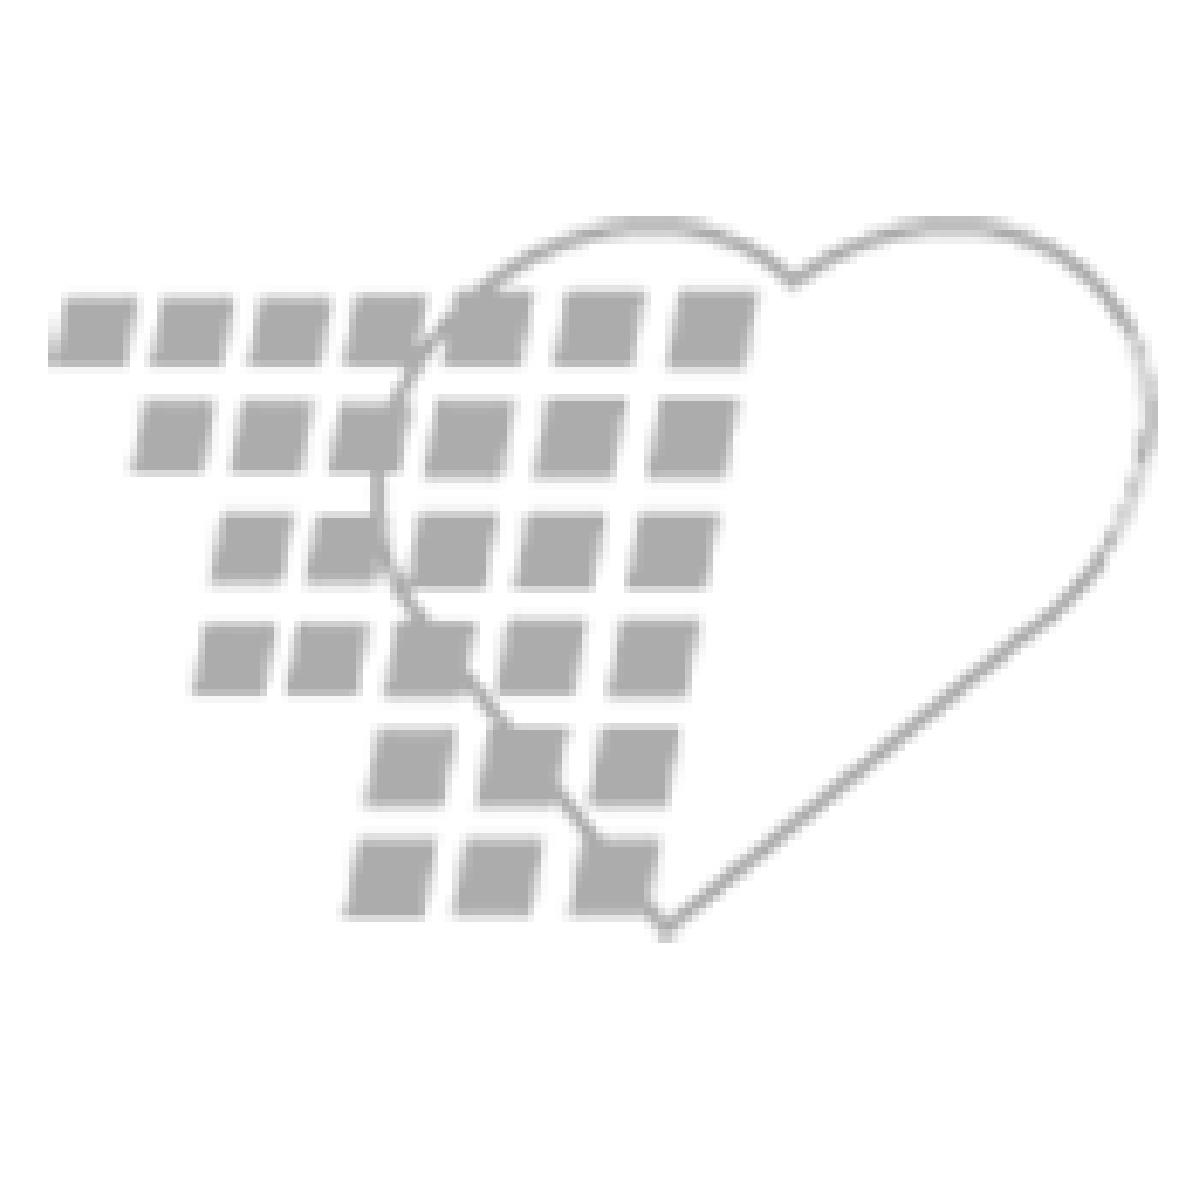 14-17-7254 Nasco Life/form® Simulated Individual Burn Roll - 1st Degree